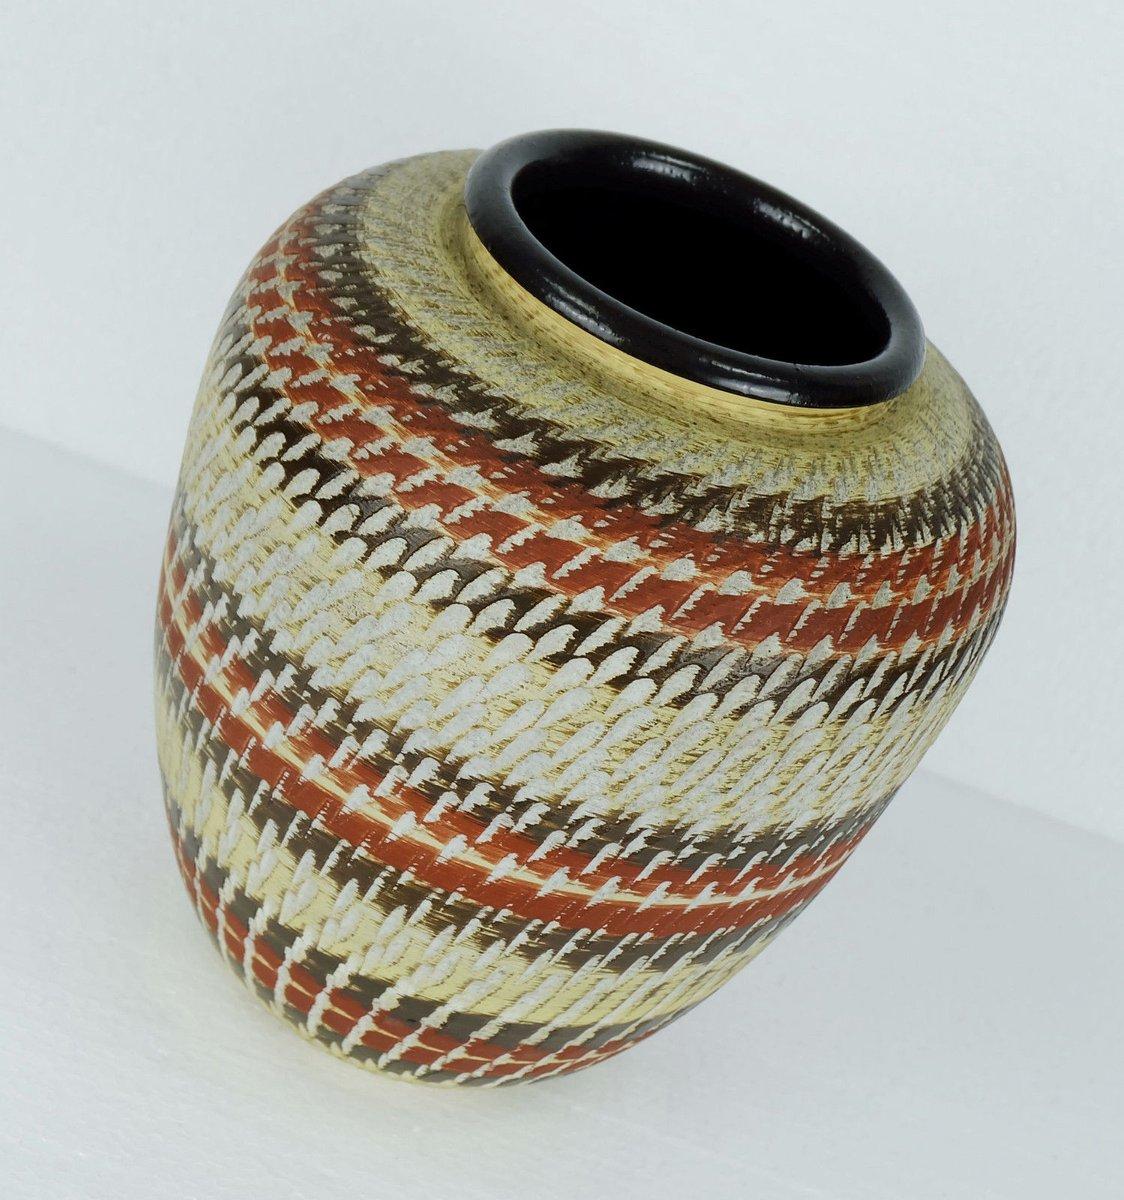 post bauhaus art deco vase from duemler breiden for sale at pamono. Black Bedroom Furniture Sets. Home Design Ideas